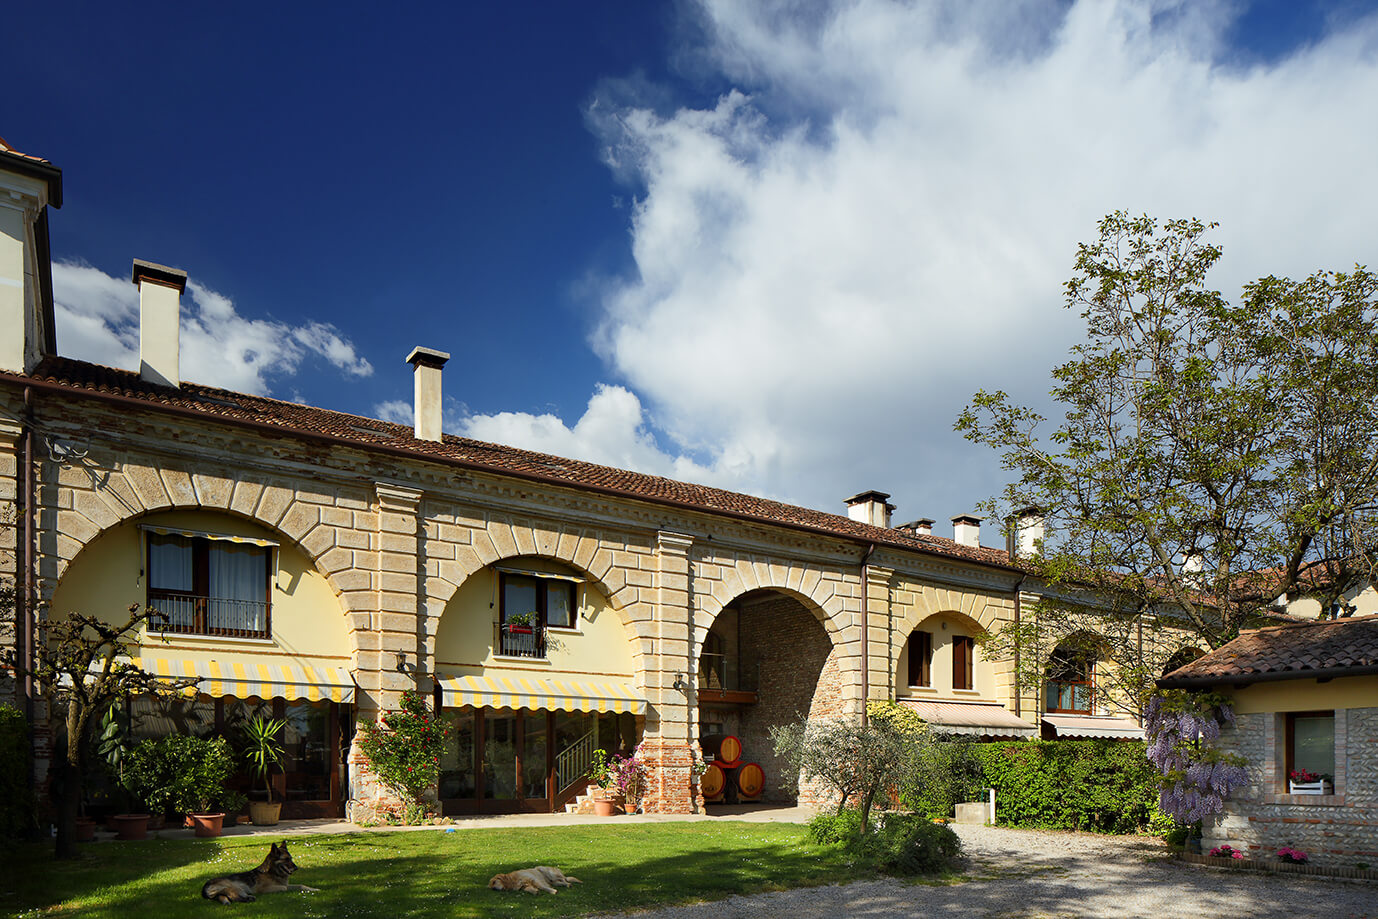 _Z5B2604-Pizzolato Villa 1-Aprile 2014 mr